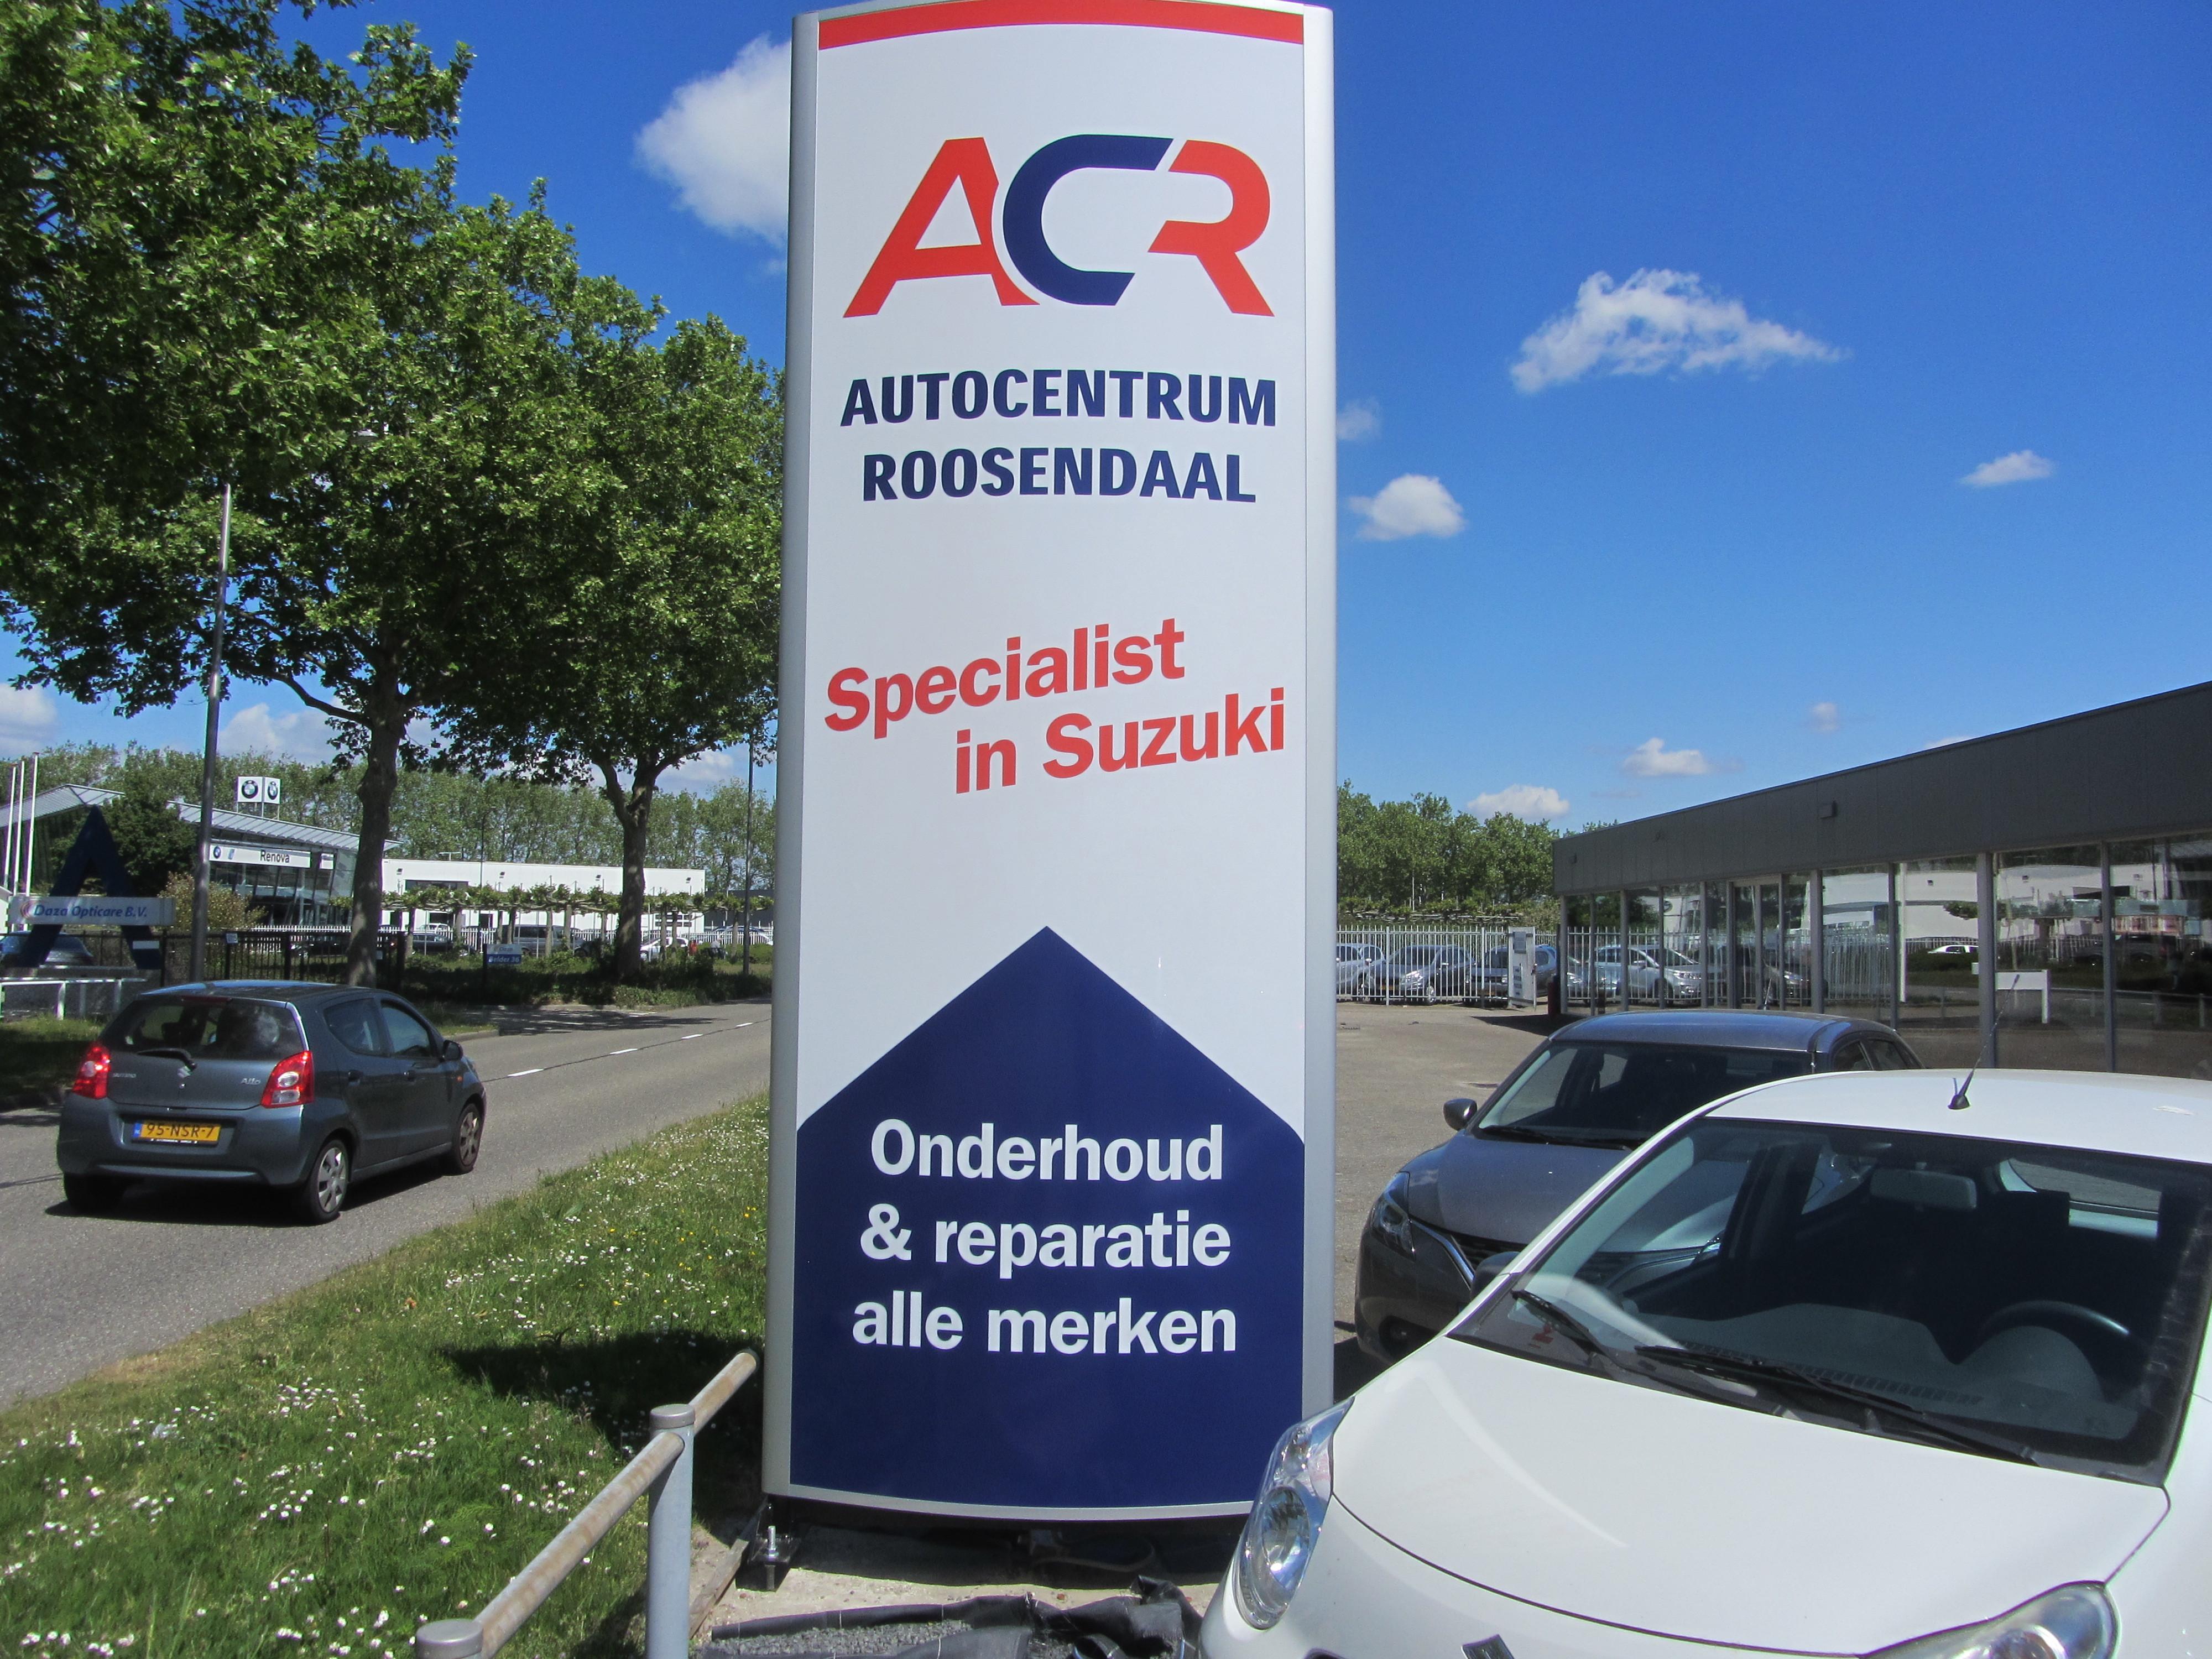 Autocentrum Roosendaal